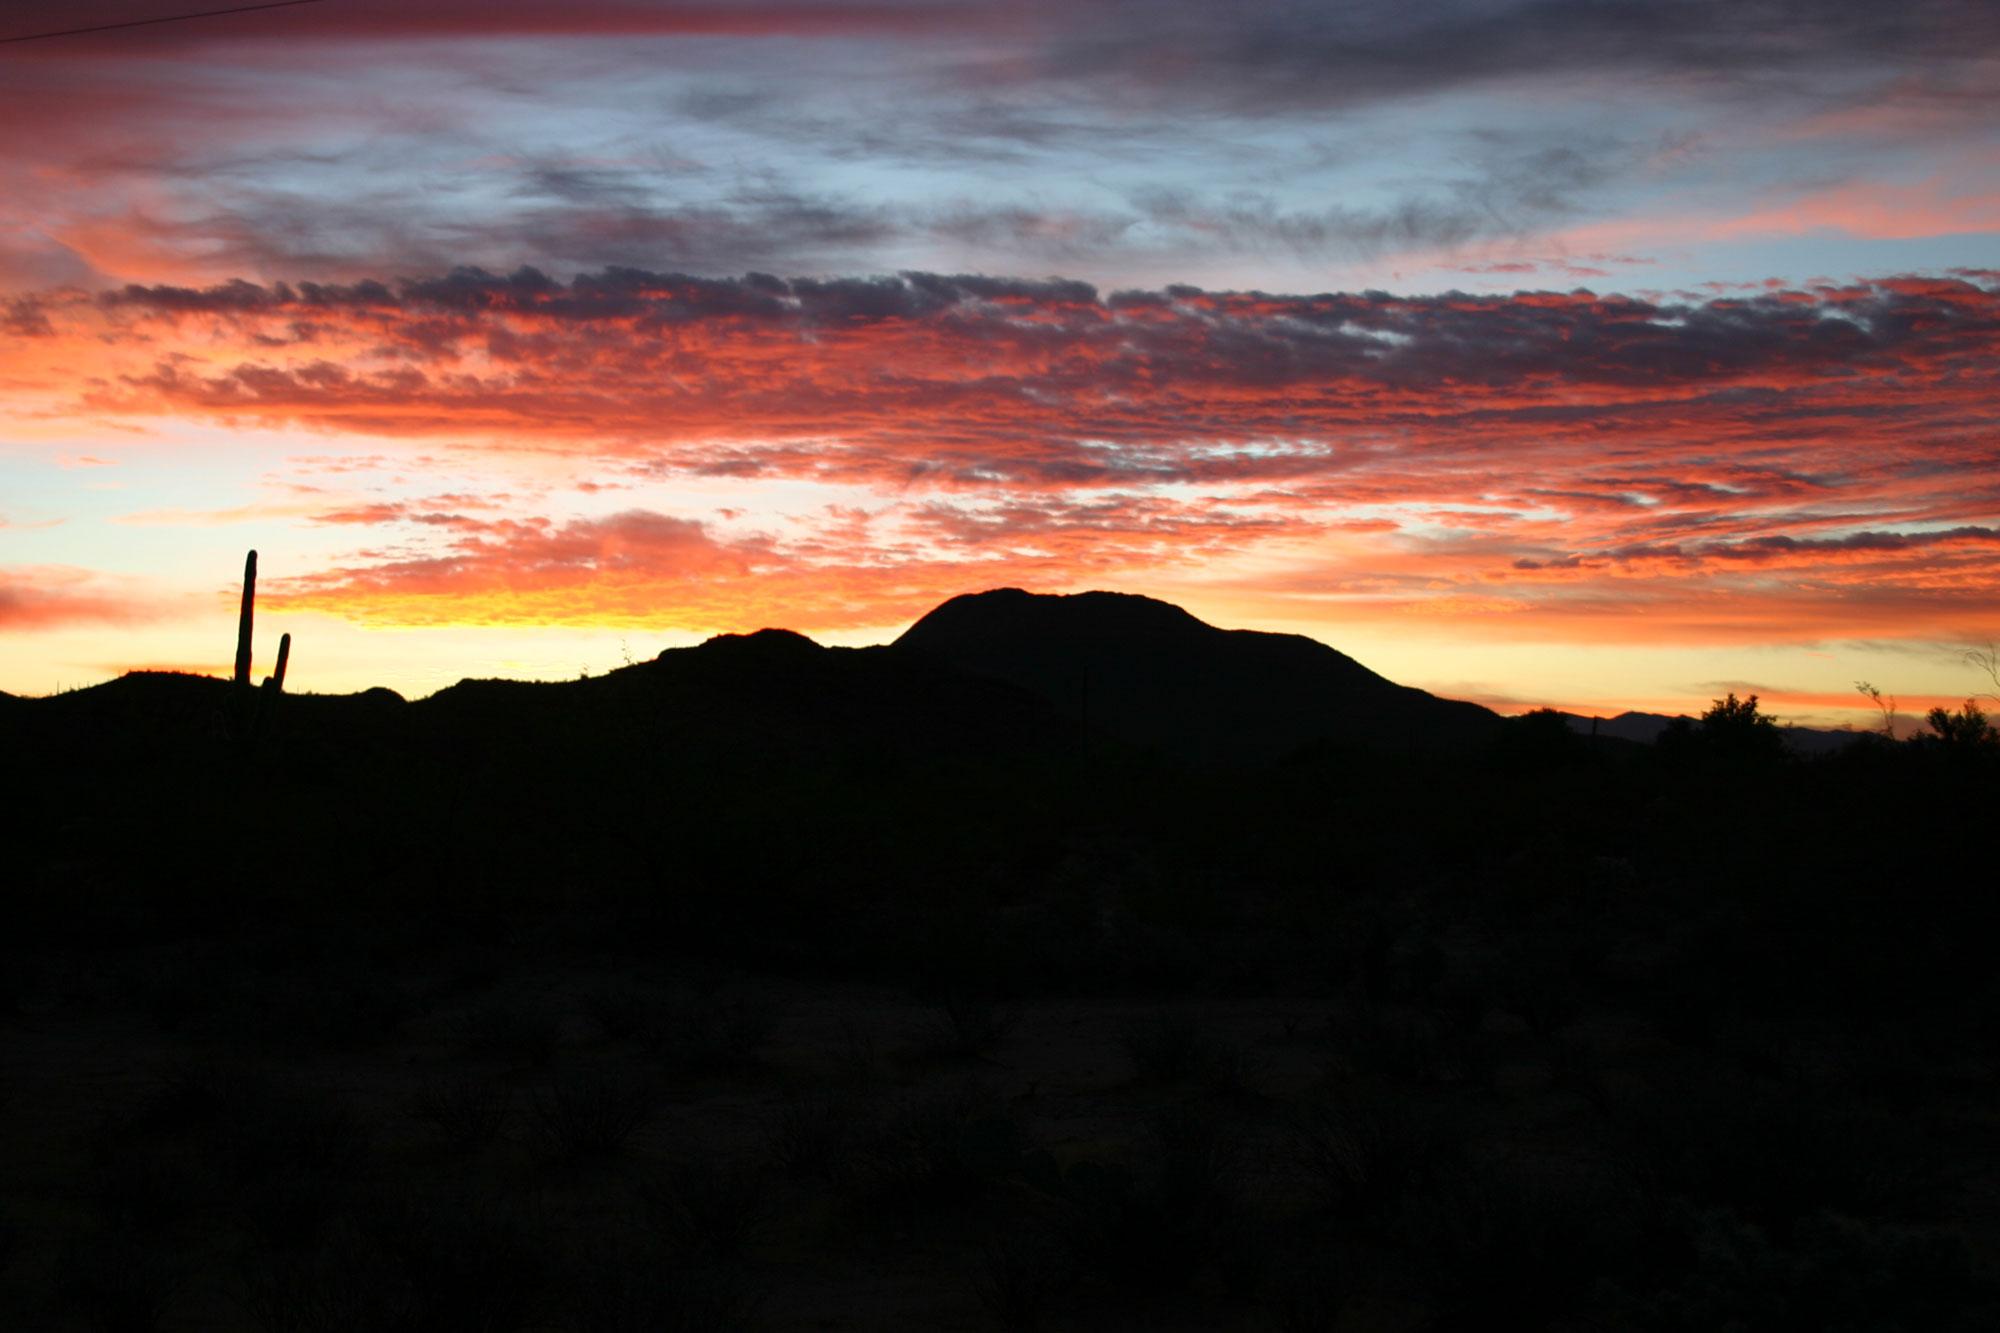 mnt-sunset